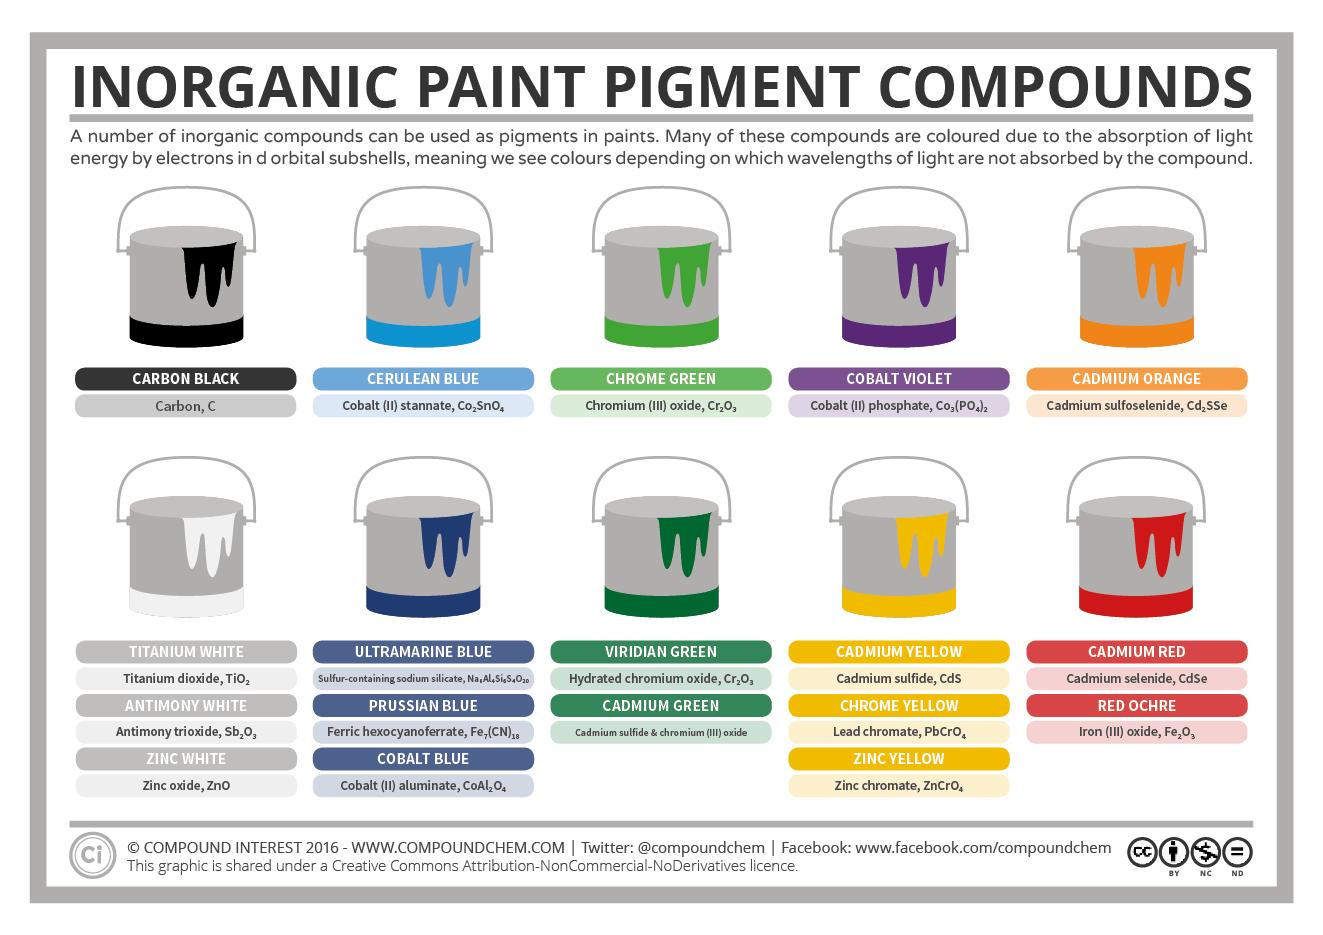 Inorganic Pigment Compounds